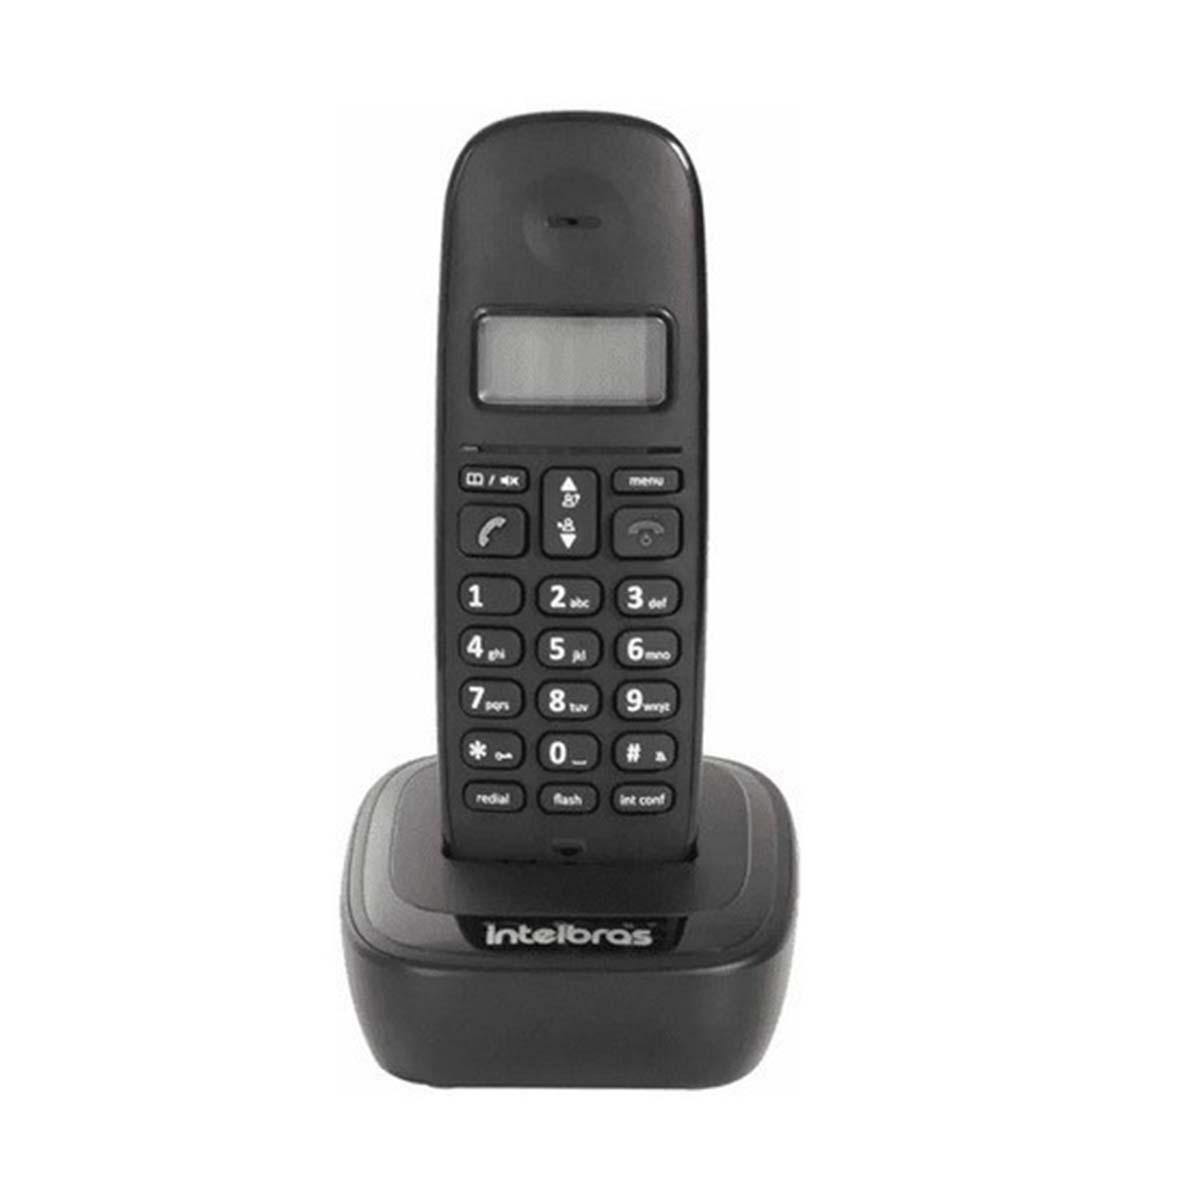 Kit 05 Telefone Sem Fio Intelbras Ts 2510 Preto